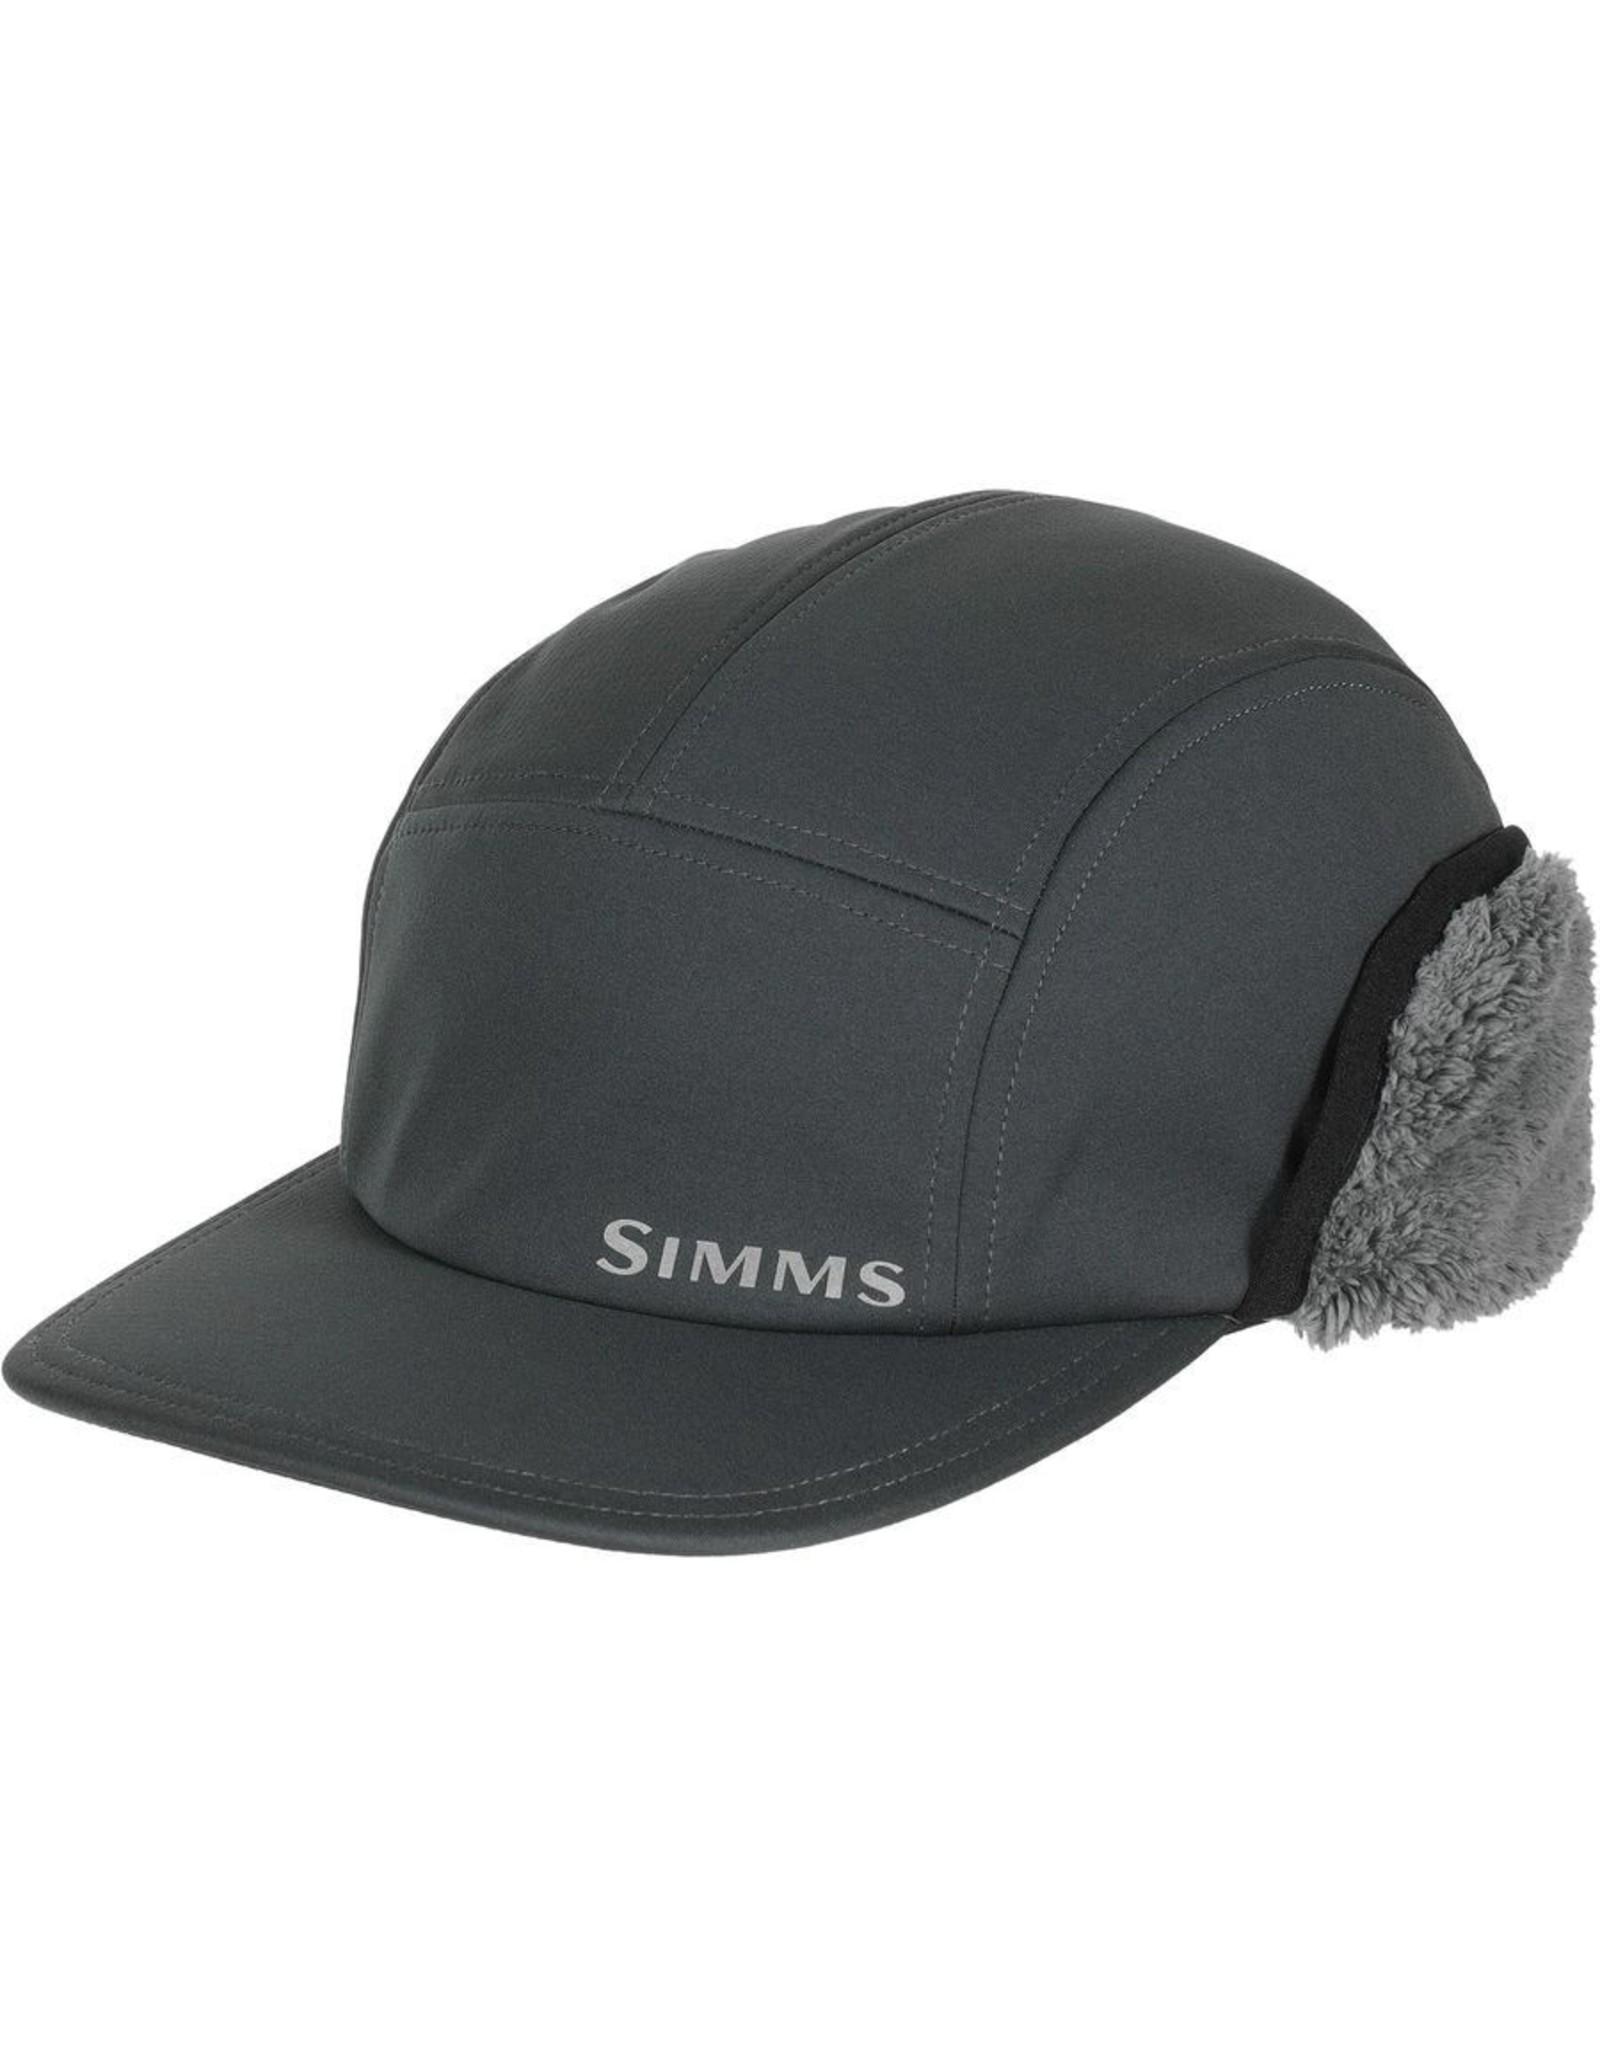 Extreme weather headgear, with Polartec® Windbloc® performance